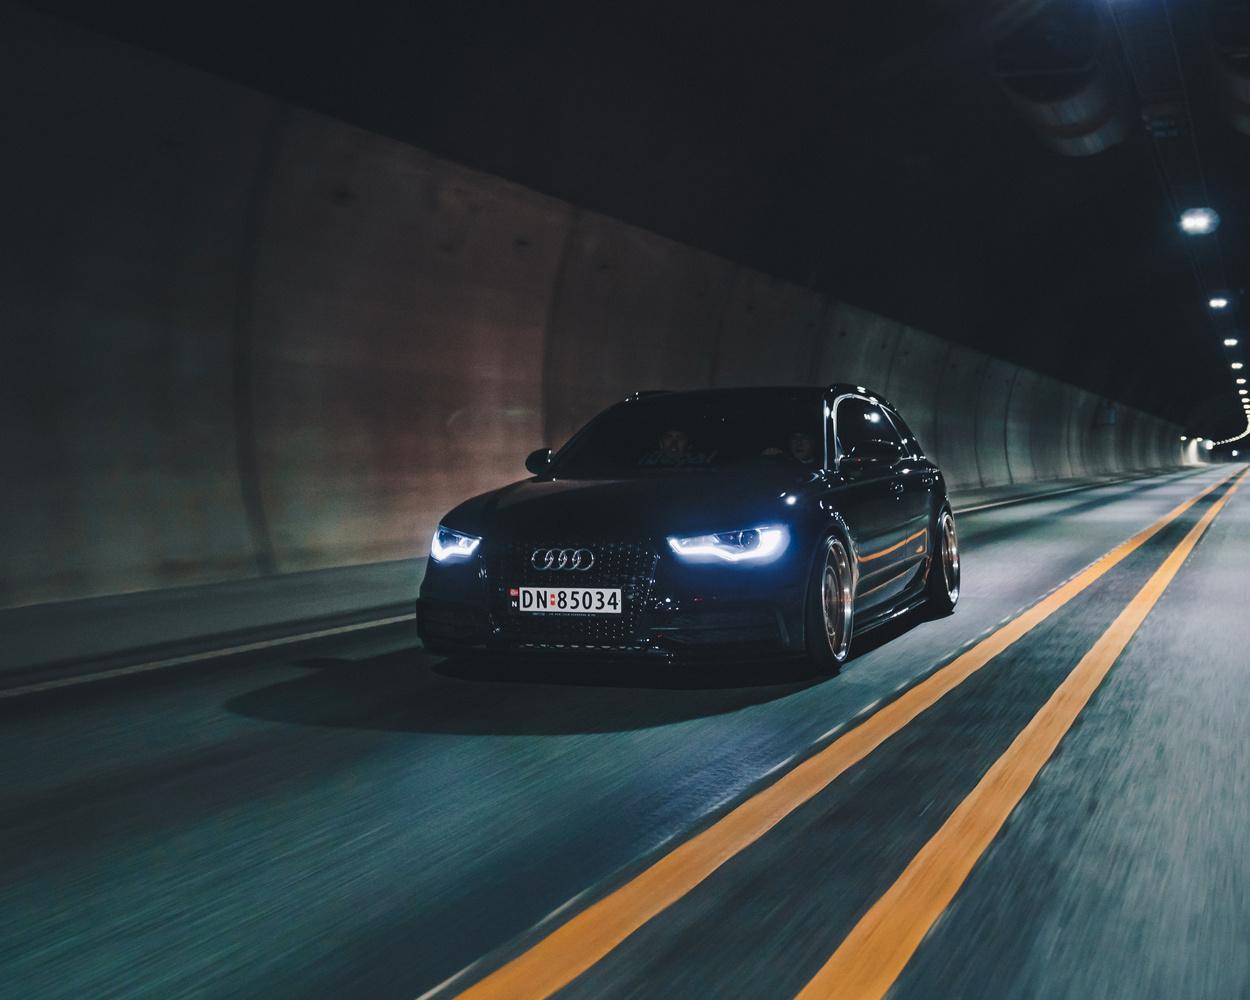 Audi A6 Rolling 4 by Henrik Utne